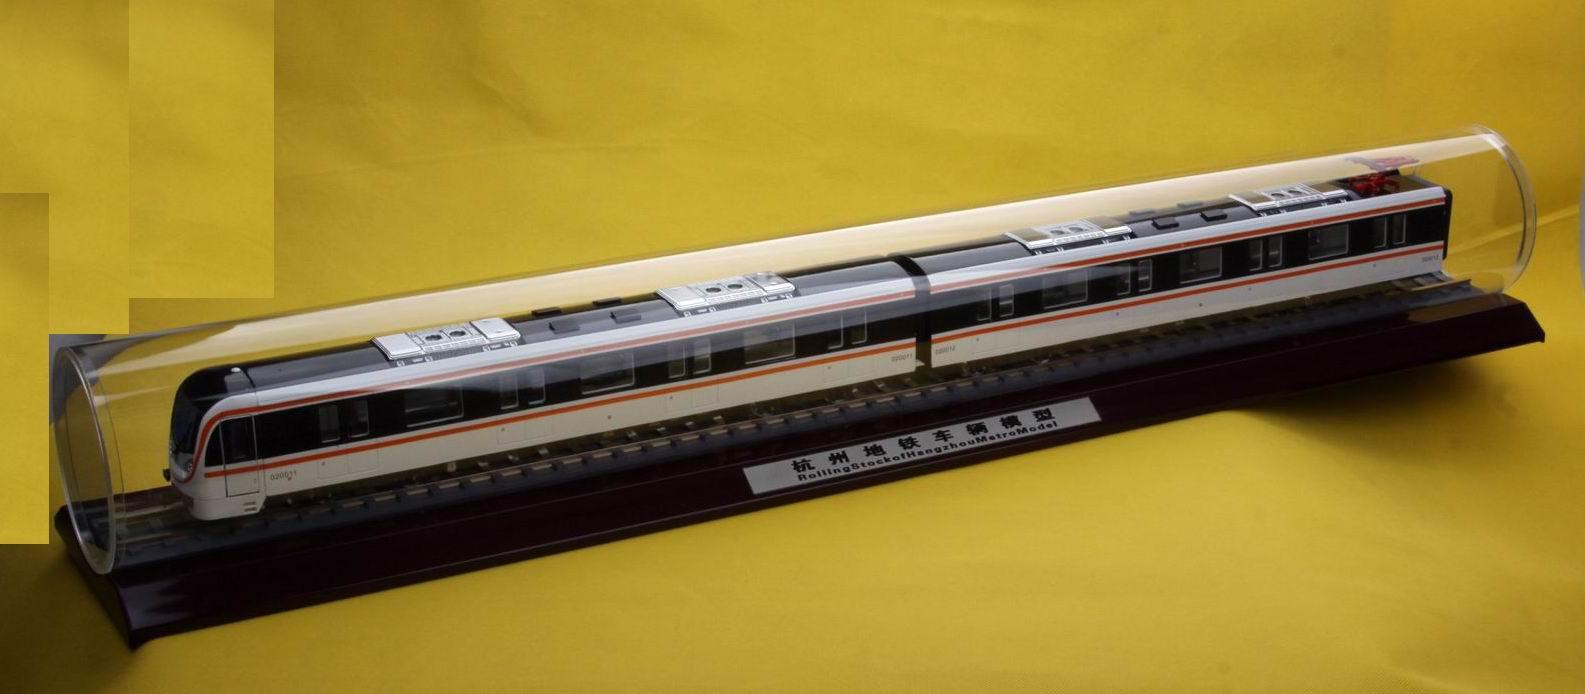 CSR中国南车杭州轨道交通有限公司--杭州地铁模型